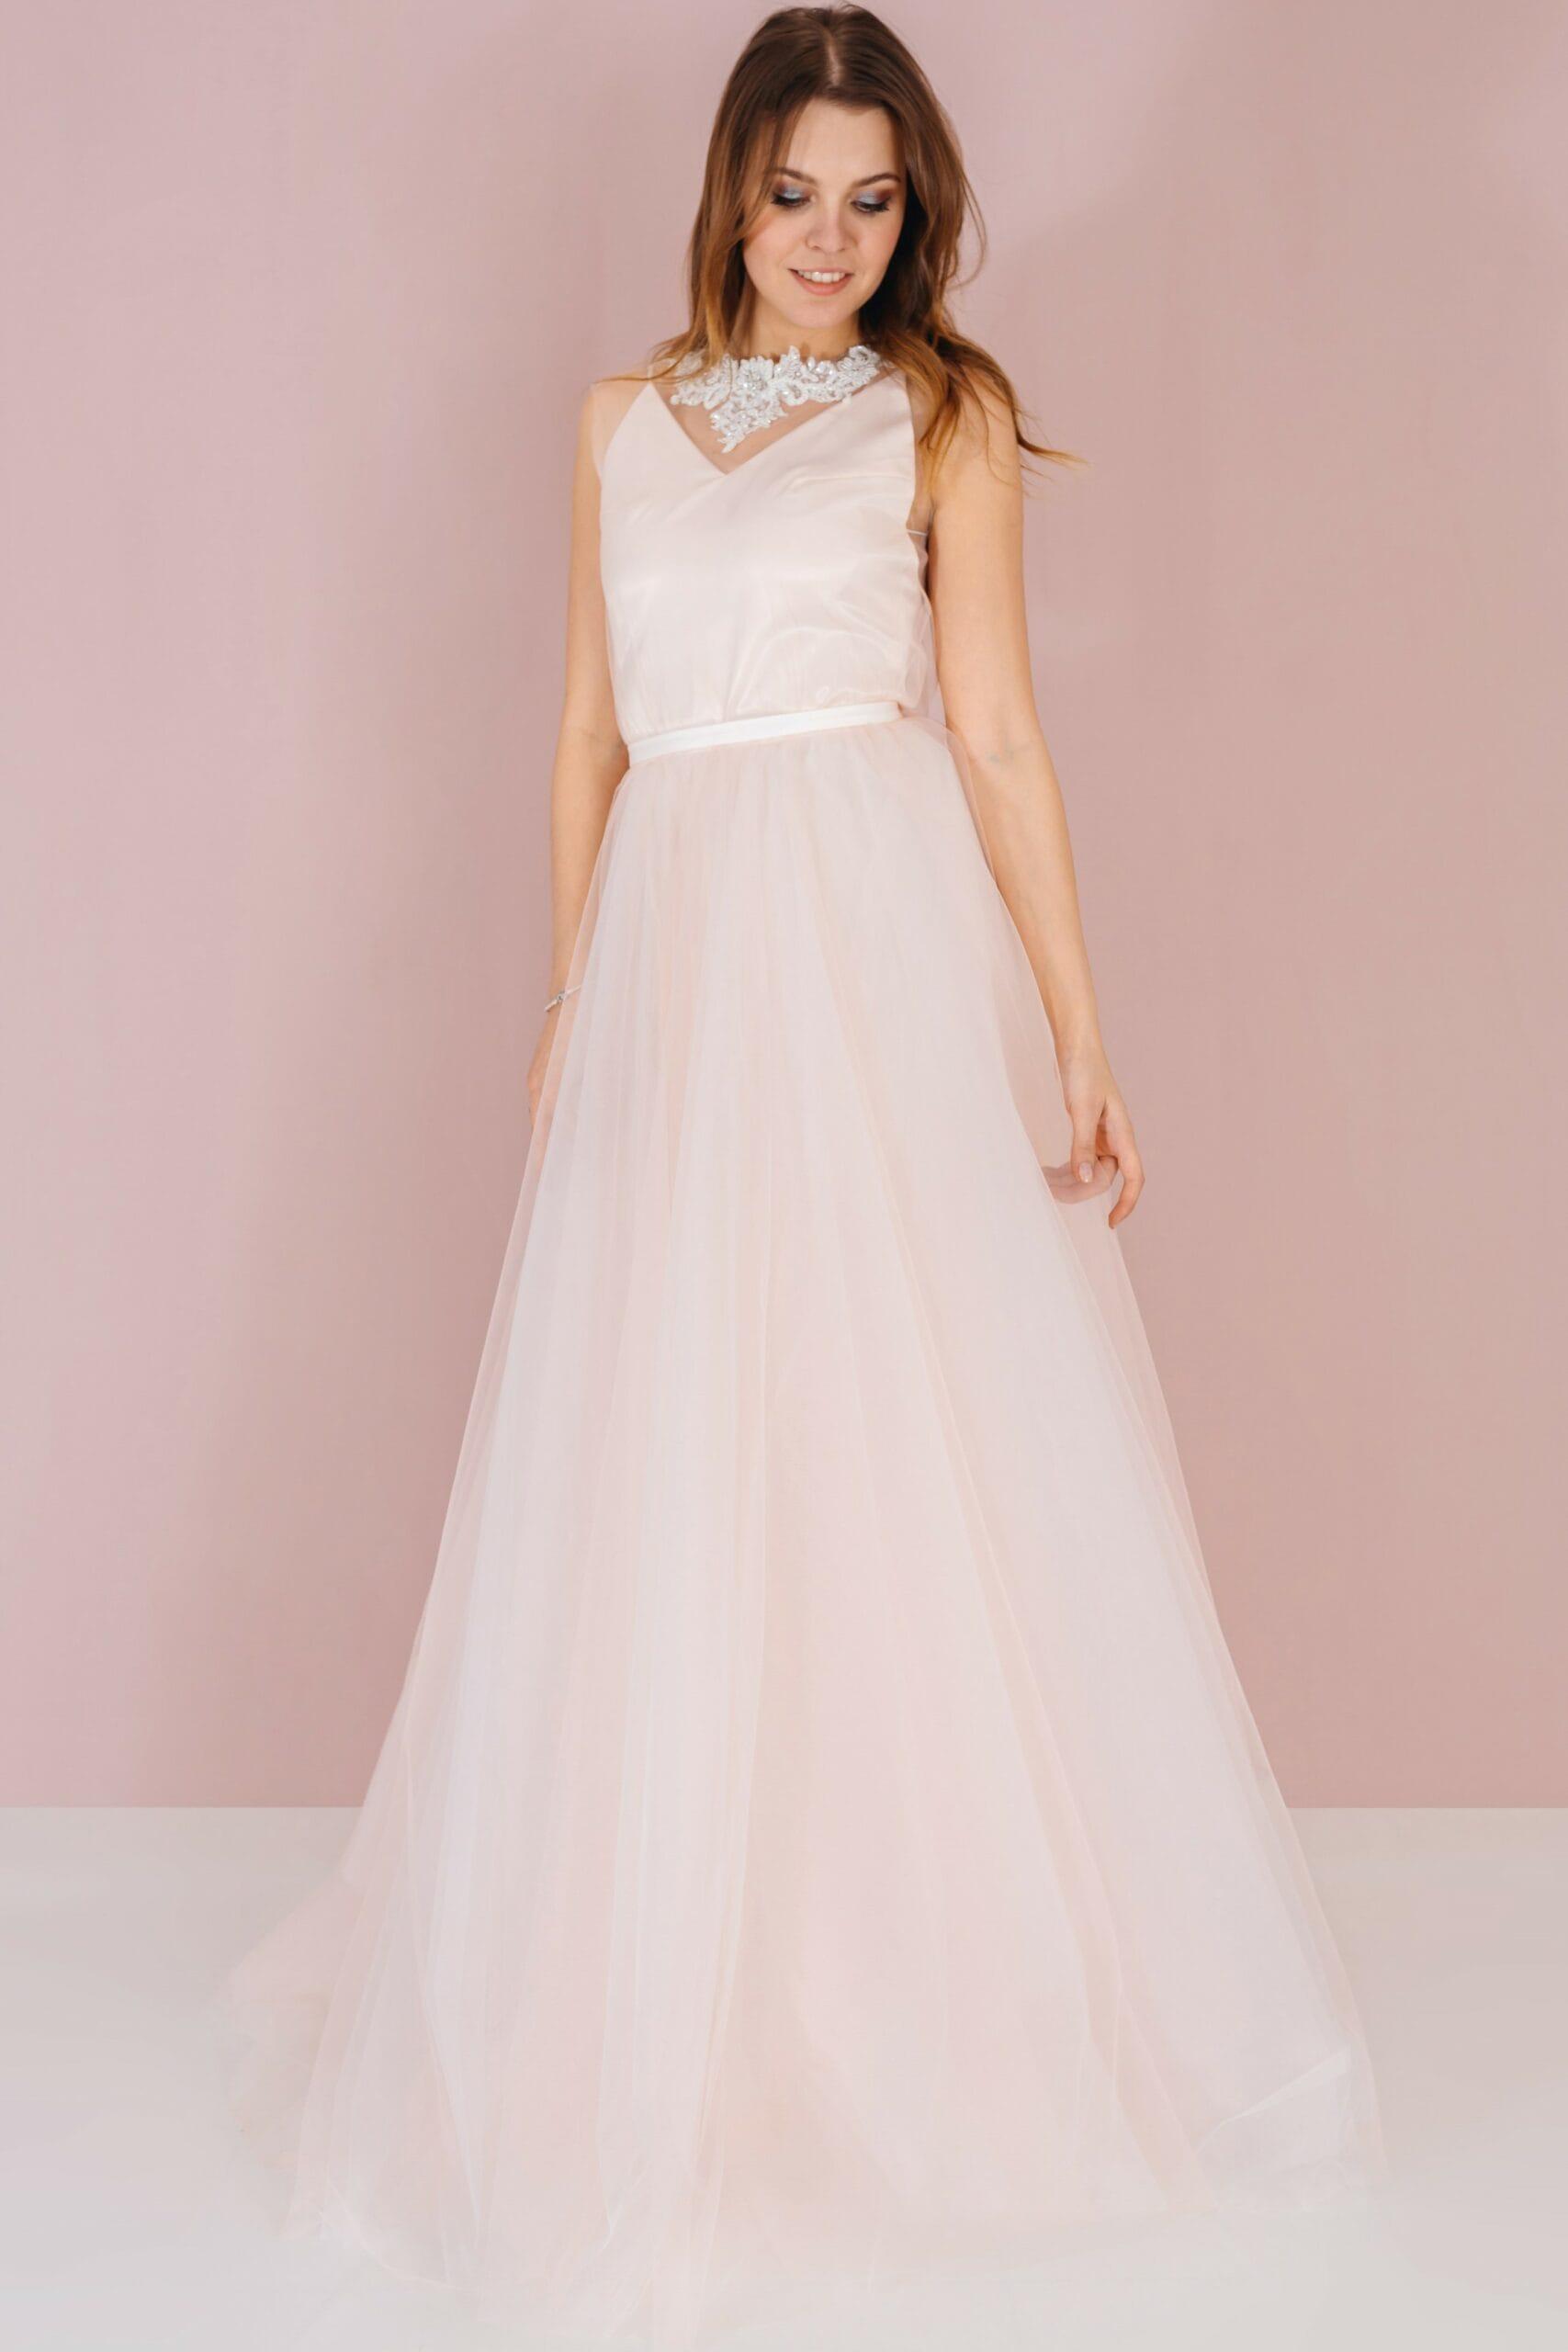 Свадебное платье HARMONY, коллекция LOFT, бренд RARE BRIDAL, фото 1